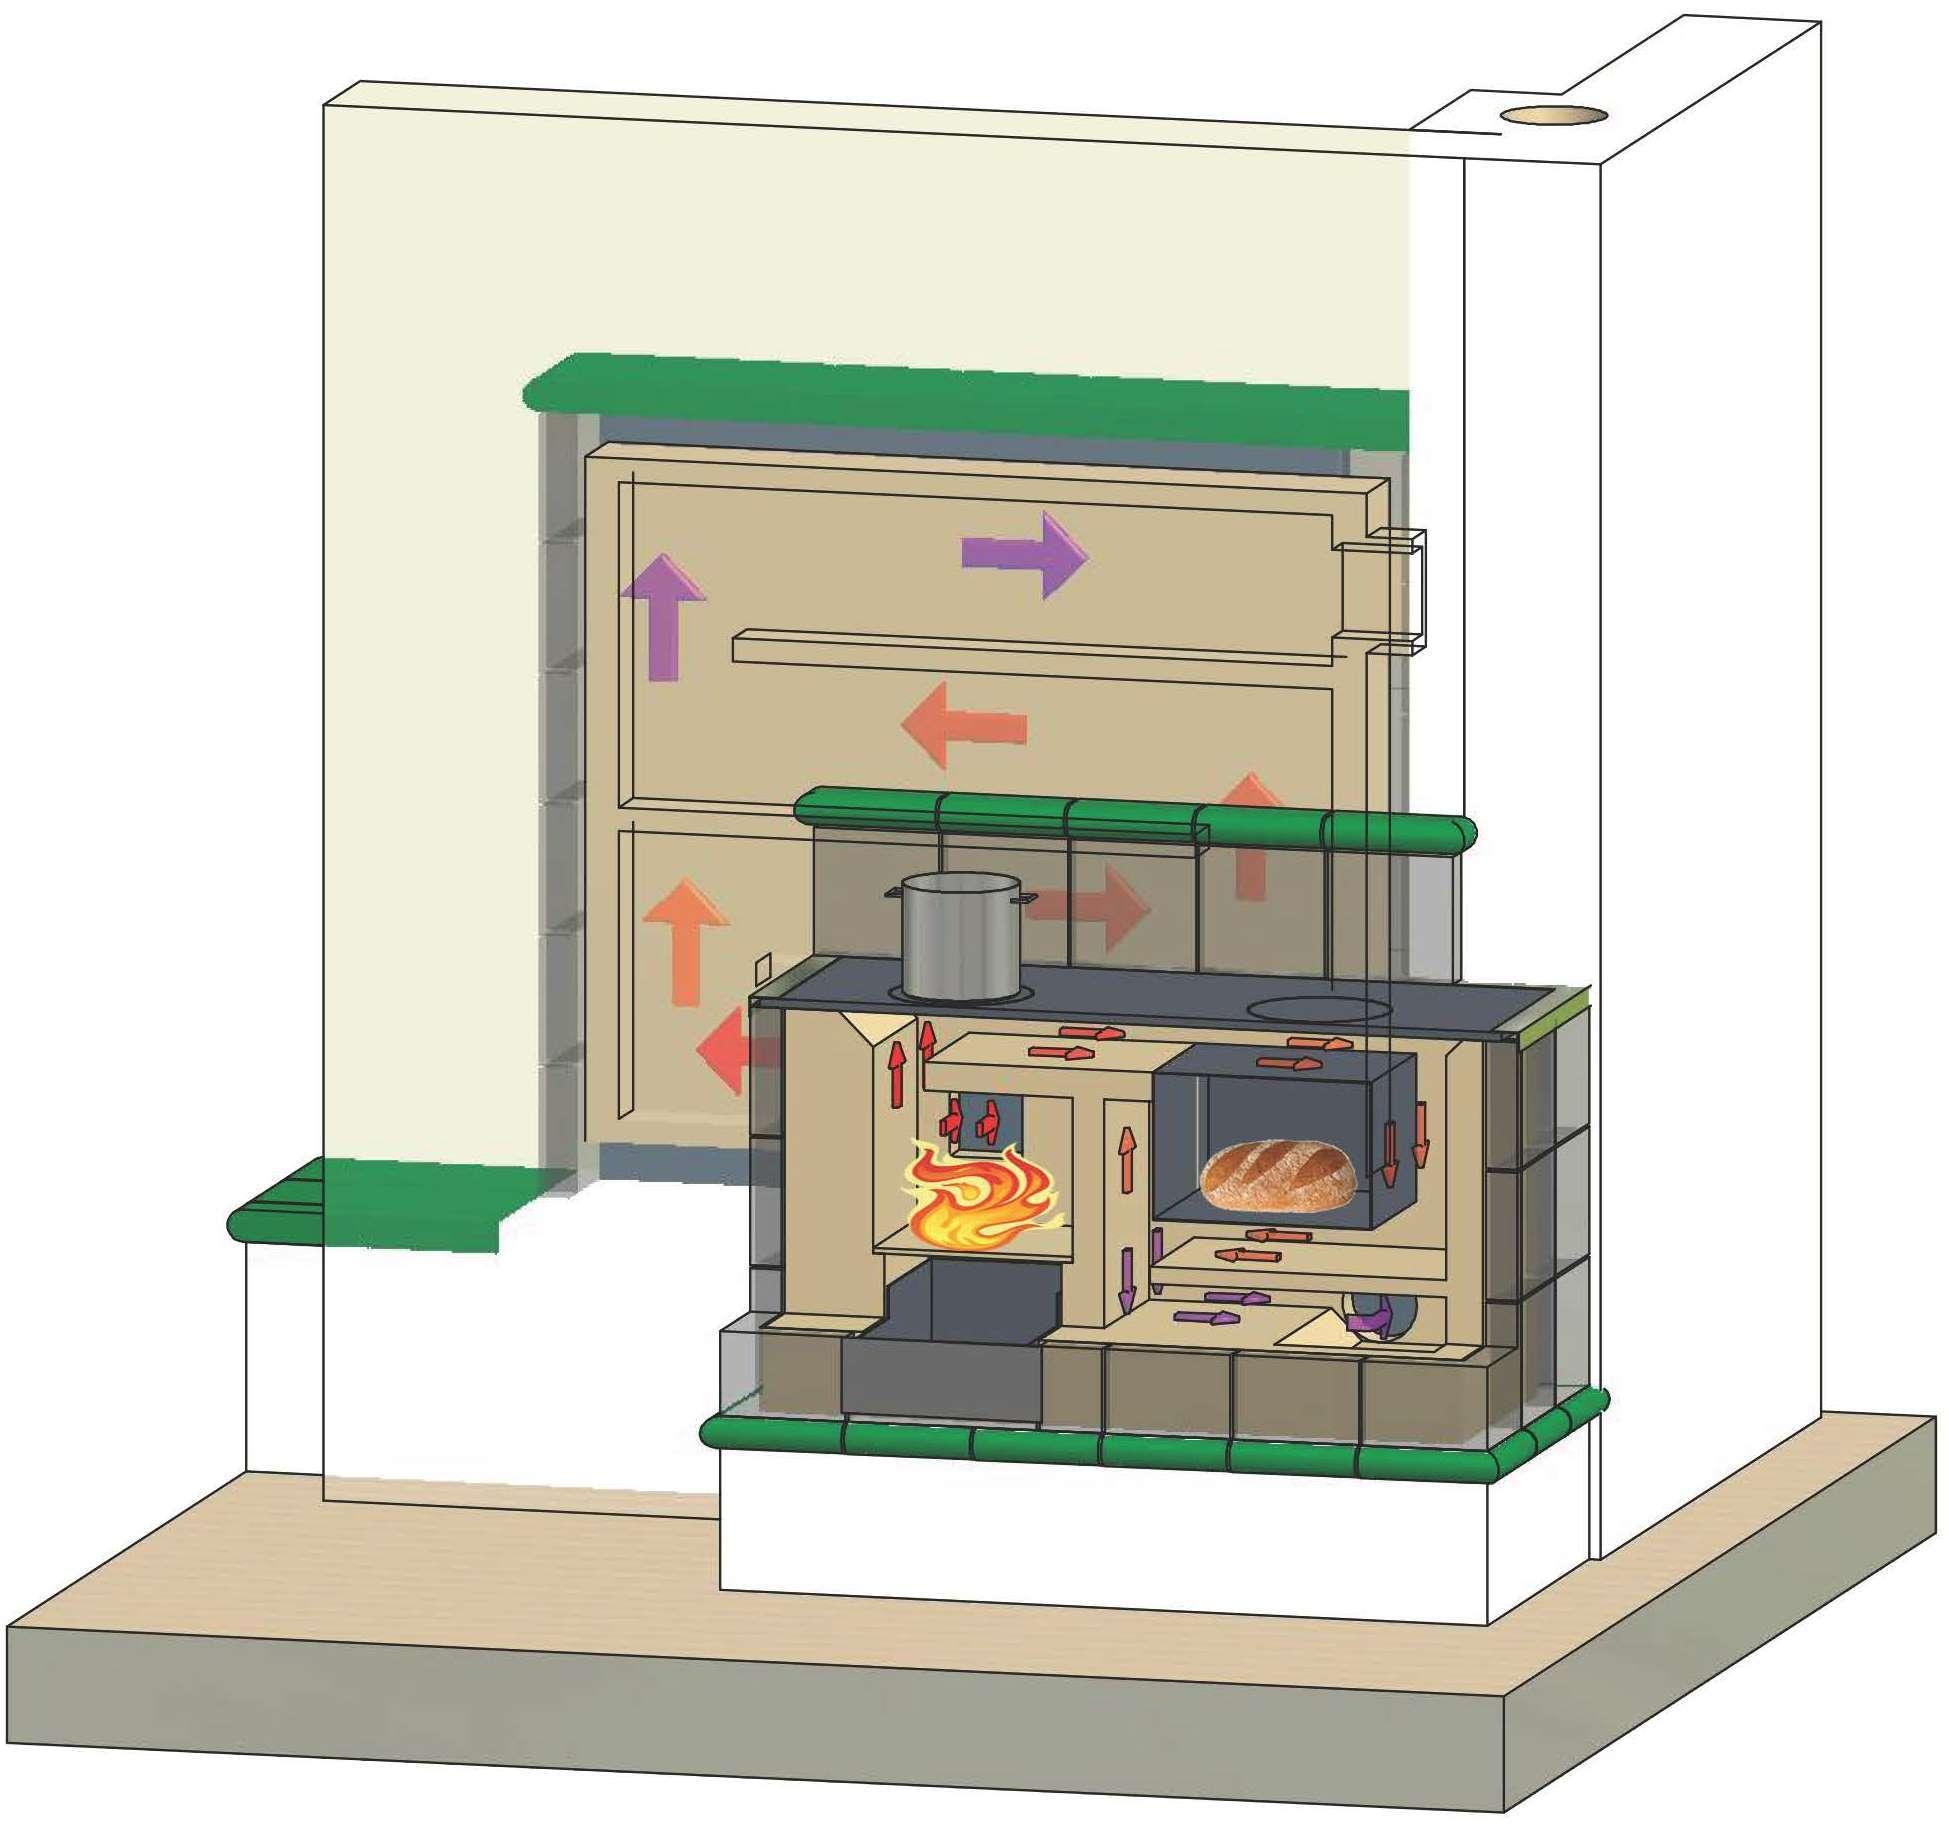 gesetzte herde hubert ratz hafnermeister. Black Bedroom Furniture Sets. Home Design Ideas